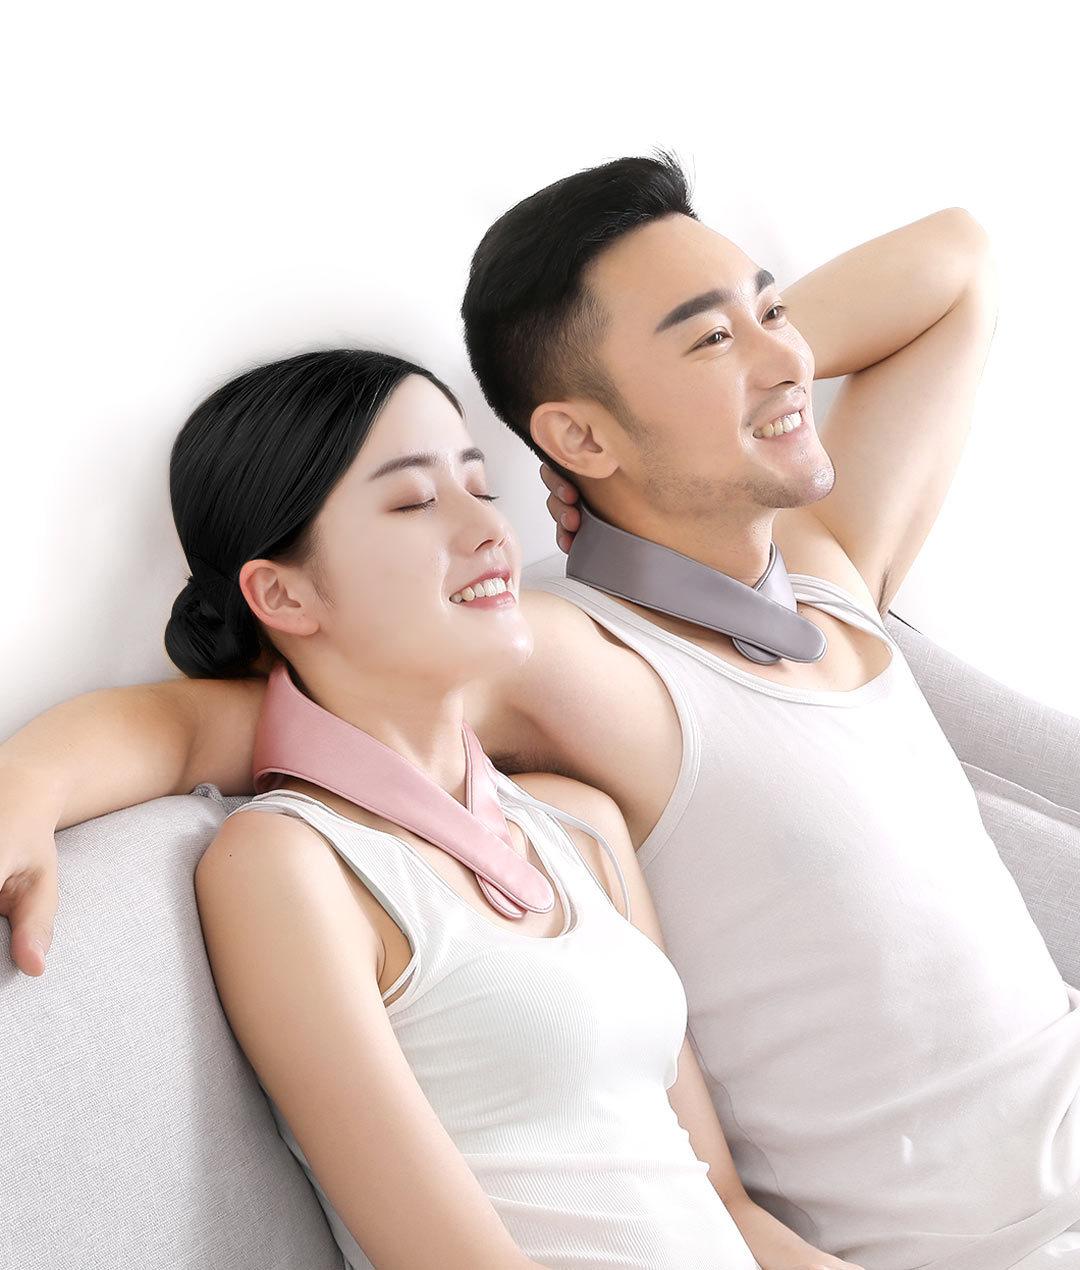 PMAグラファイト発熱真糸保護ネックバンドは頚椎を保護します。